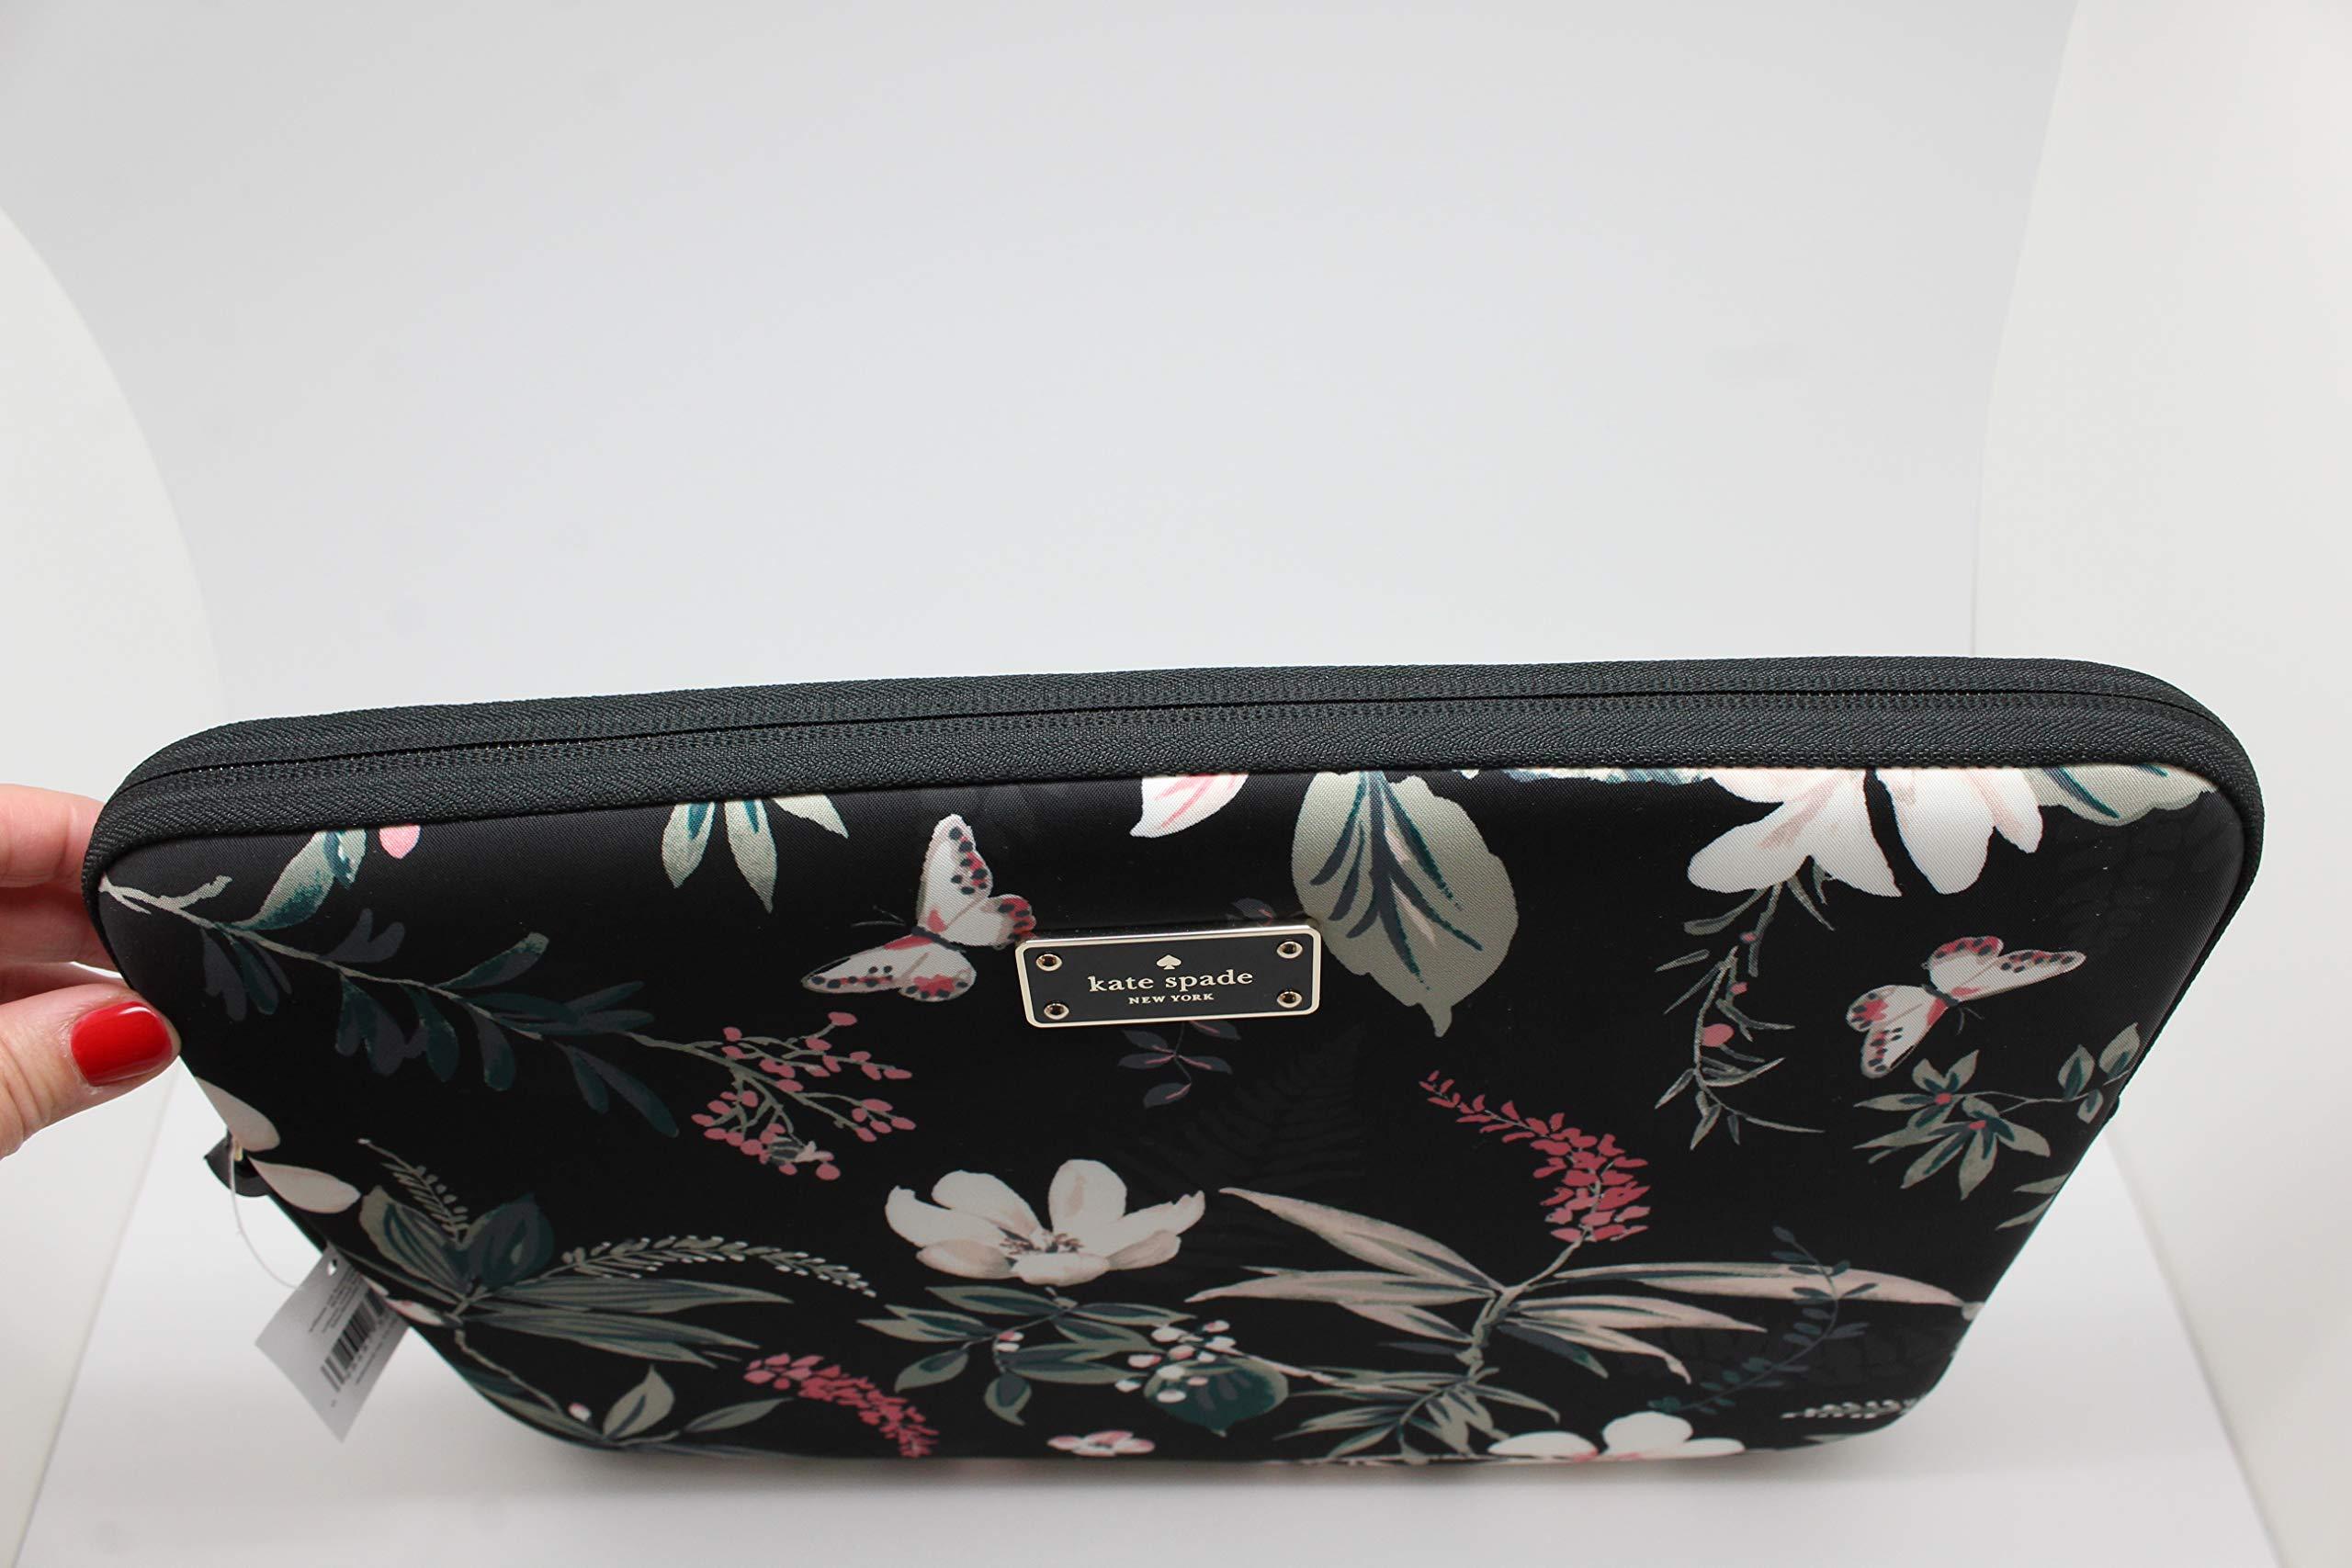 Kate Spade Wilson Rd Botanical Laptop Case Sleeve Black Multi 13'' by Kate Spade New York (Image #2)